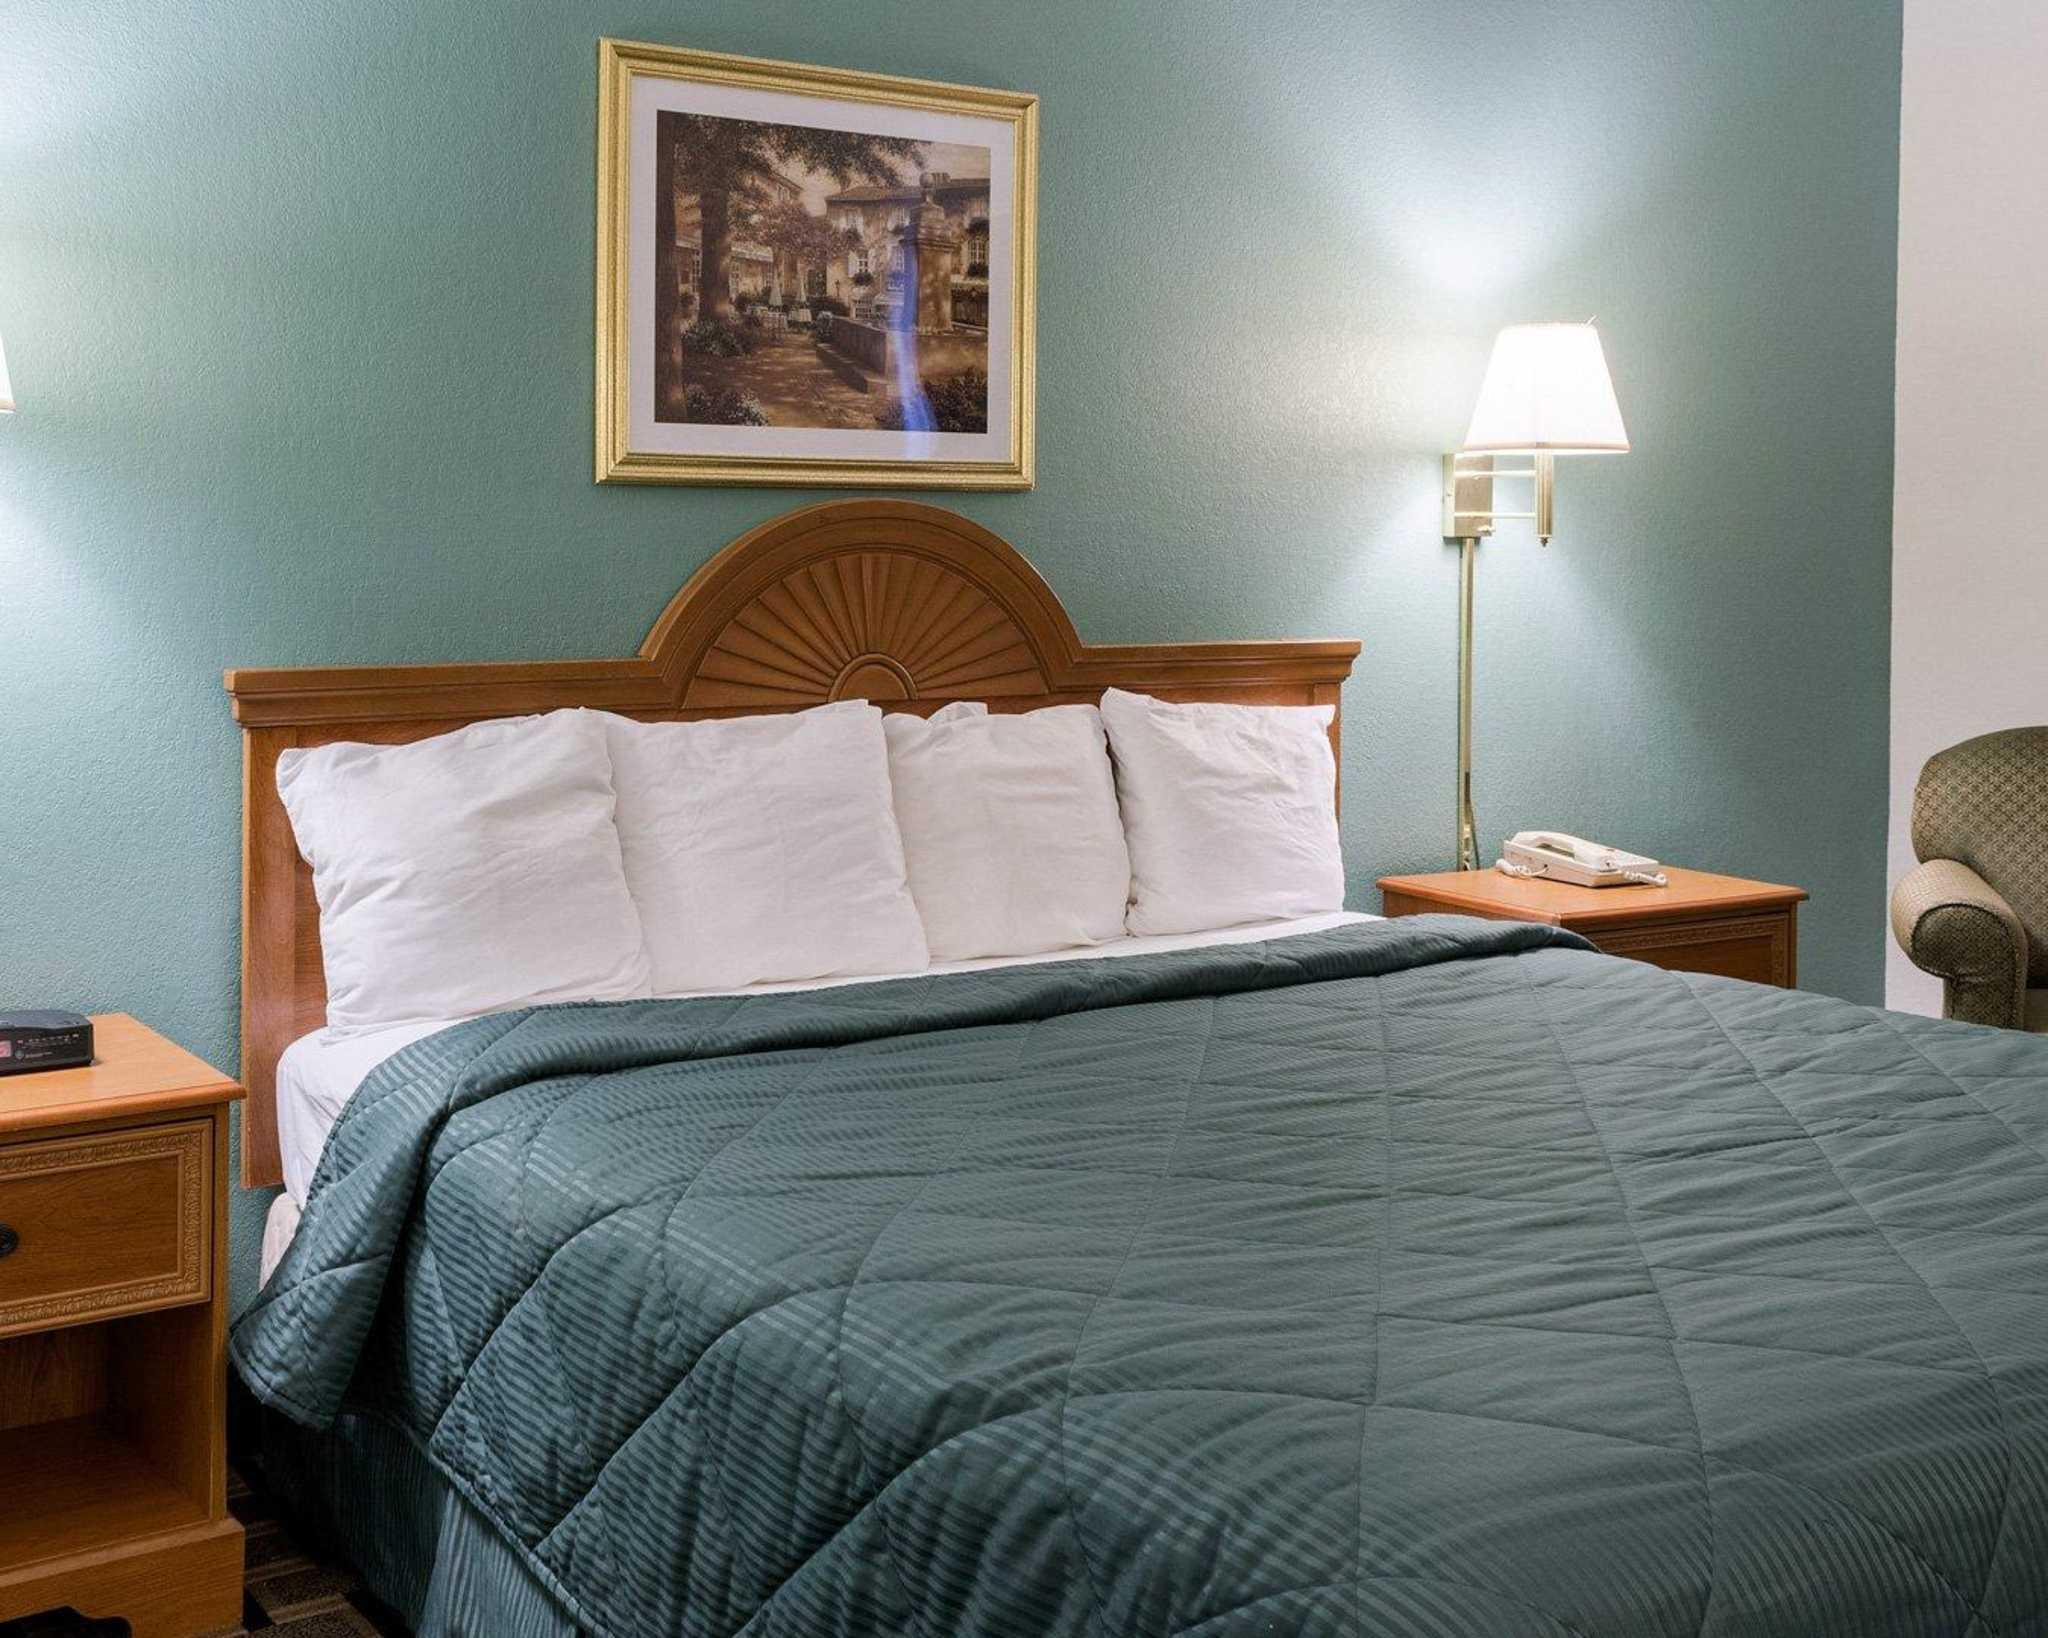 Quality Inn image 6